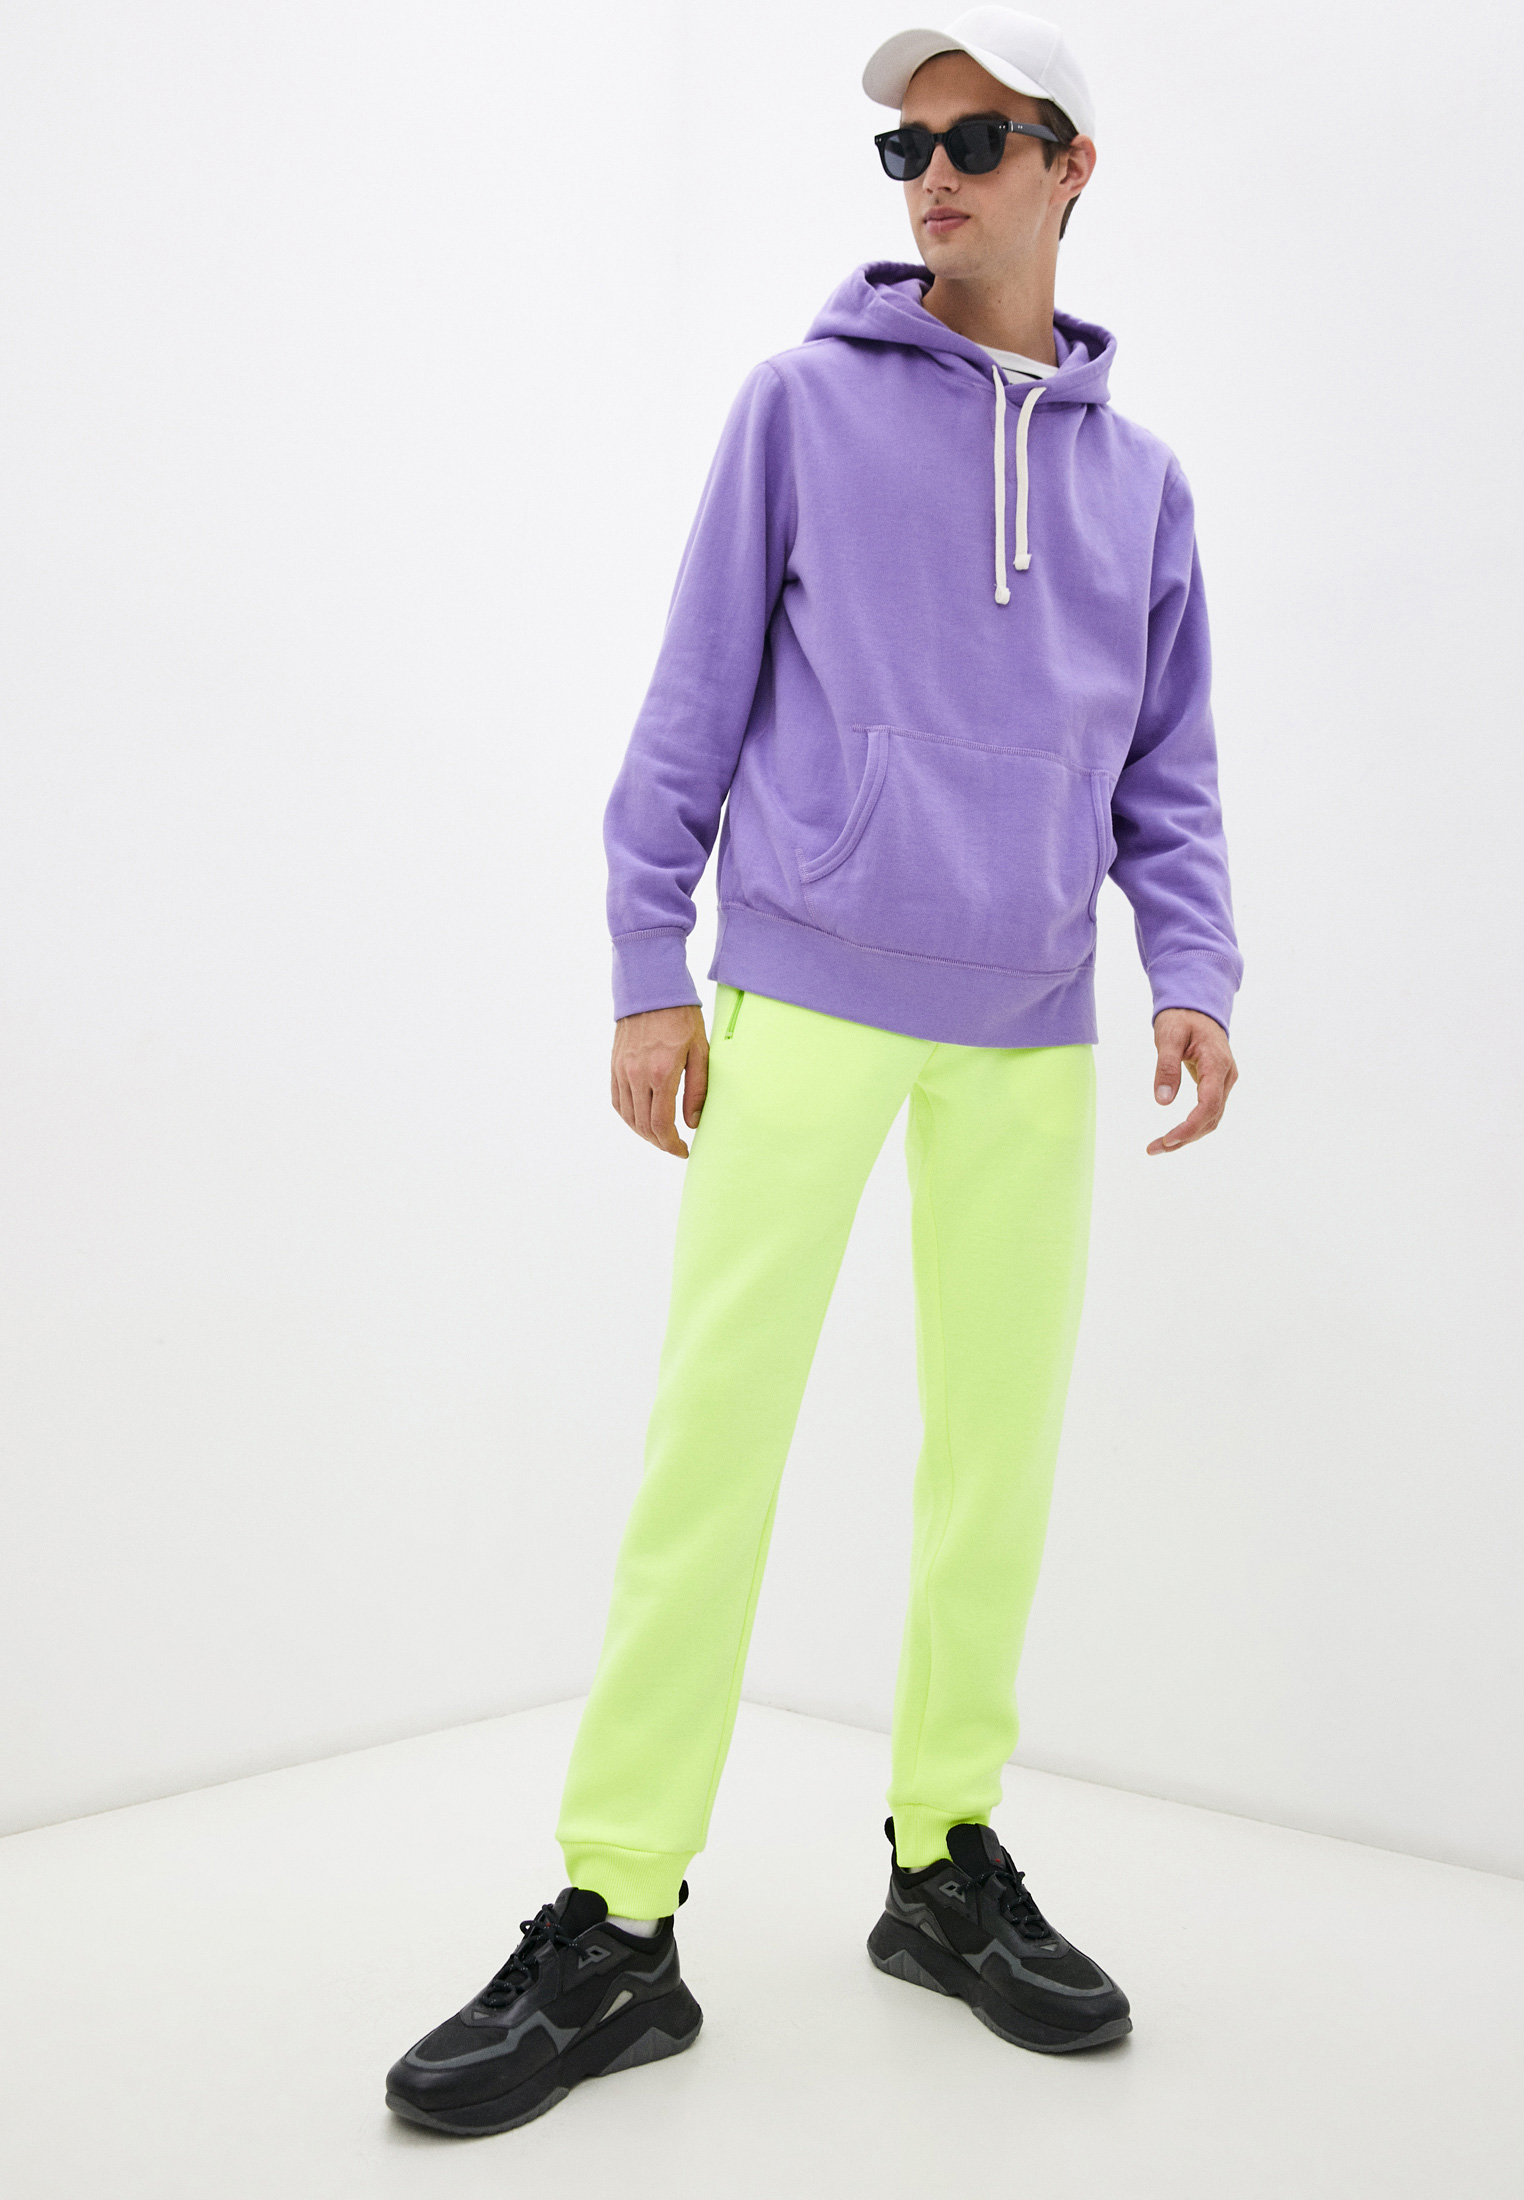 Мужские спортивные брюки Bikkembergs (Биккембергс) C 1 096 9E M 4119: изображение 3